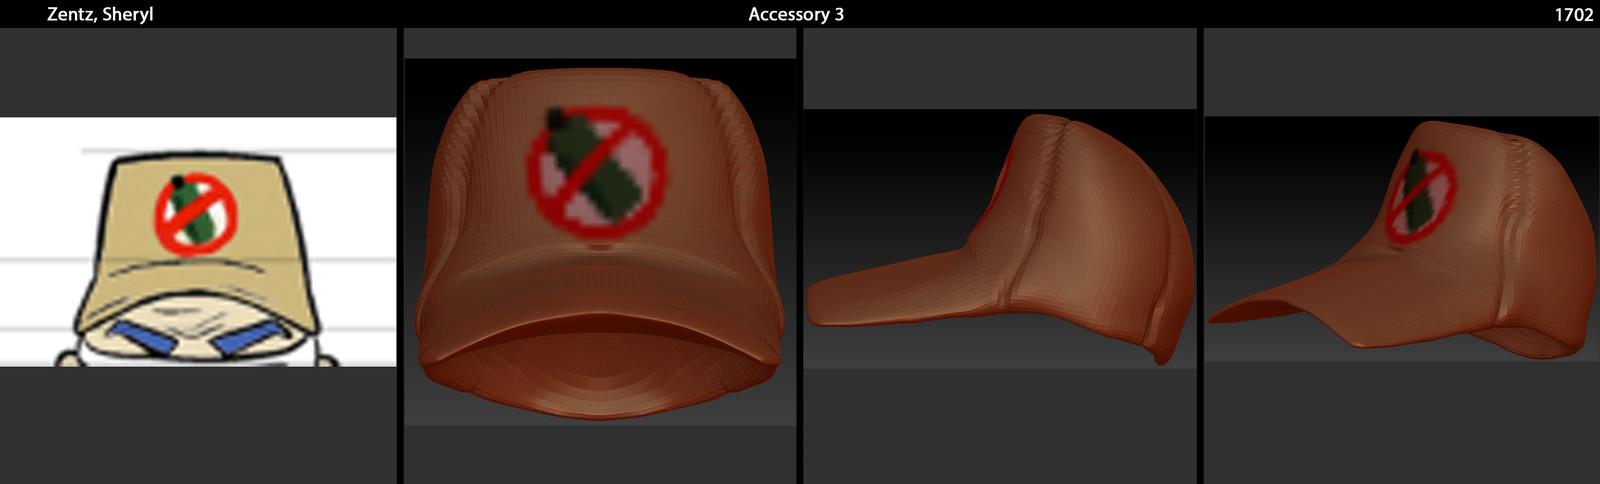 Accessory- Hat